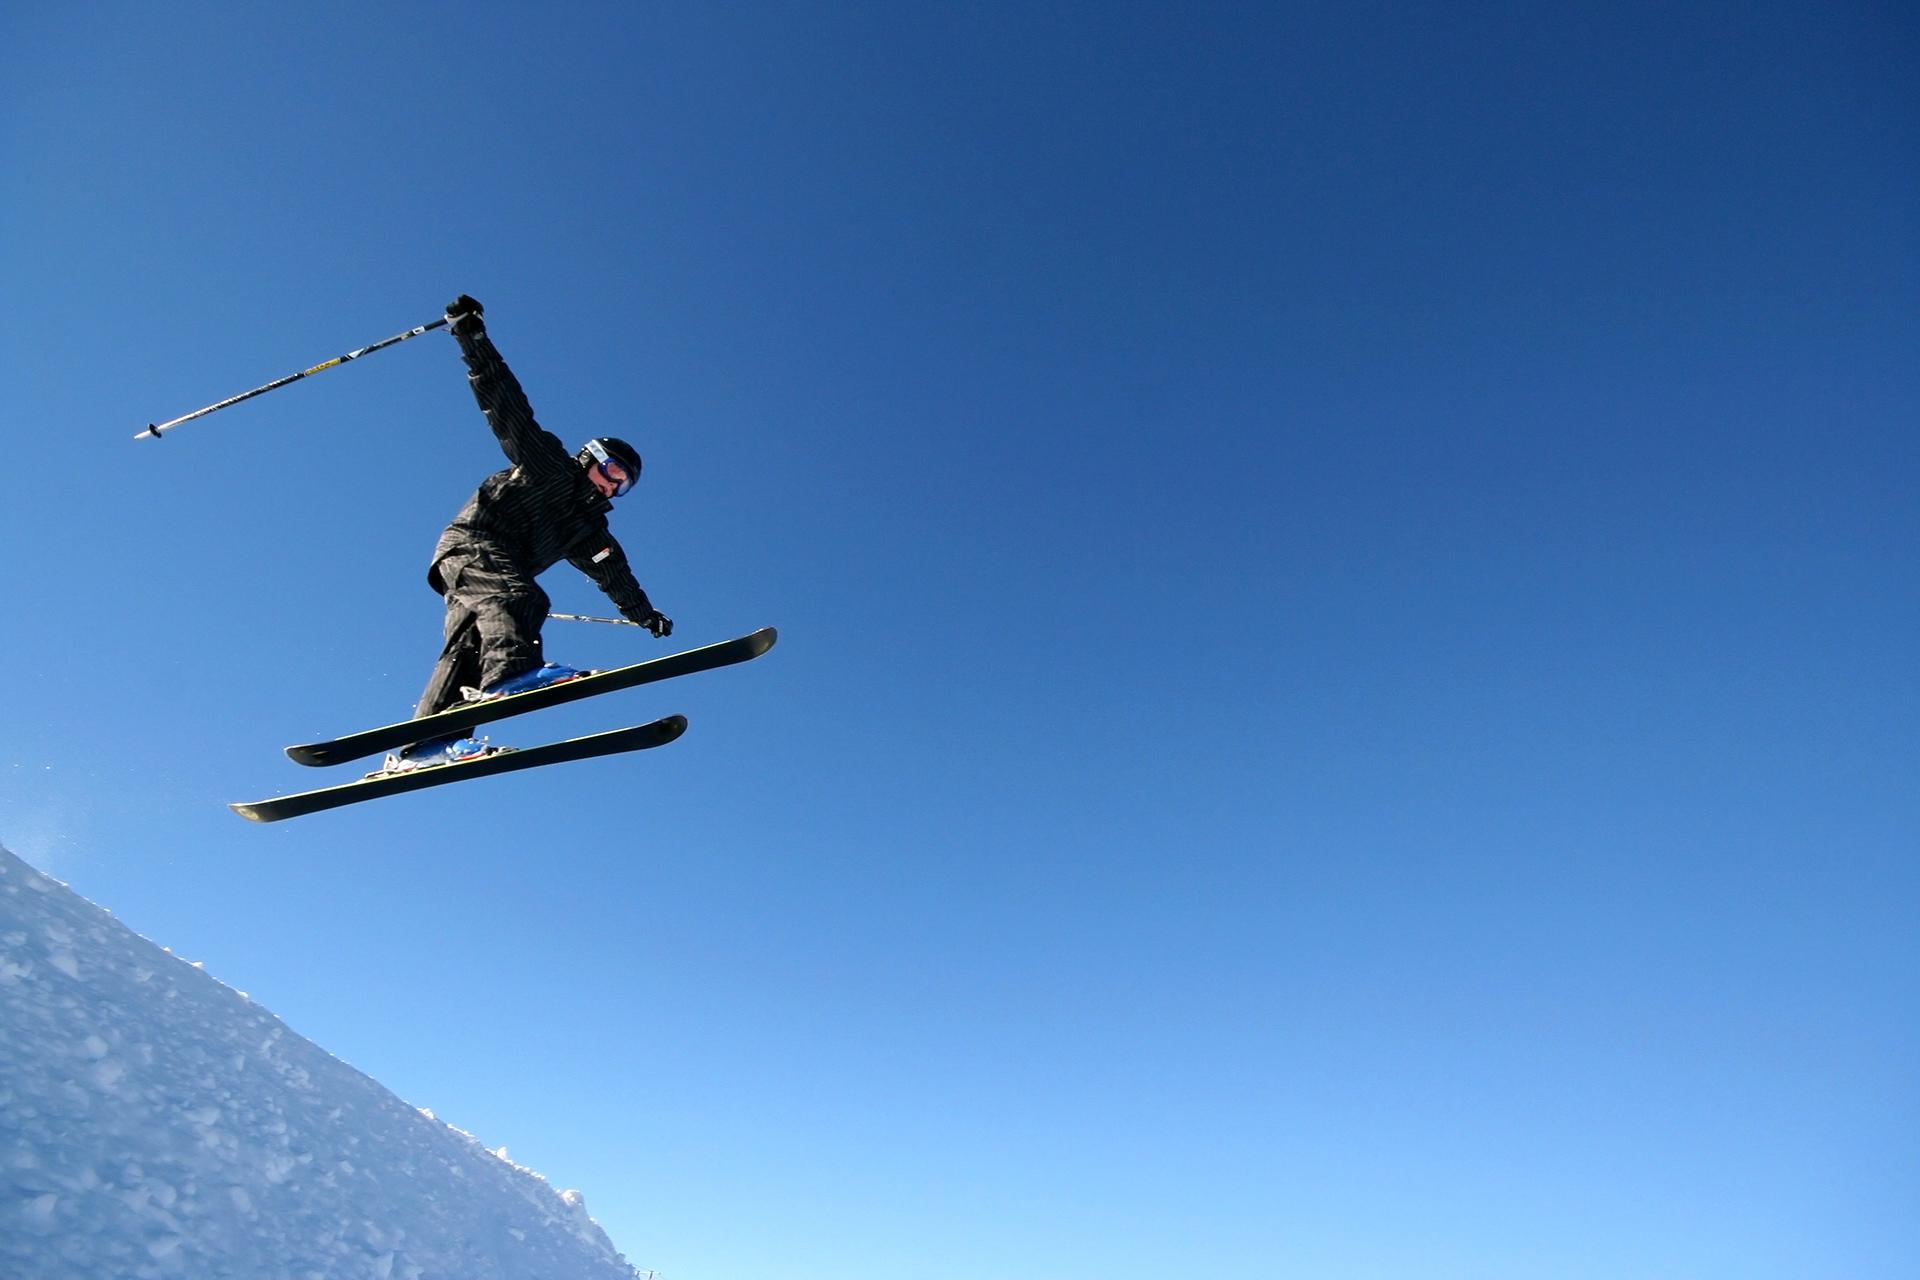 skisprung simulator gutschein ab 61. Black Bedroom Furniture Sets. Home Design Ideas